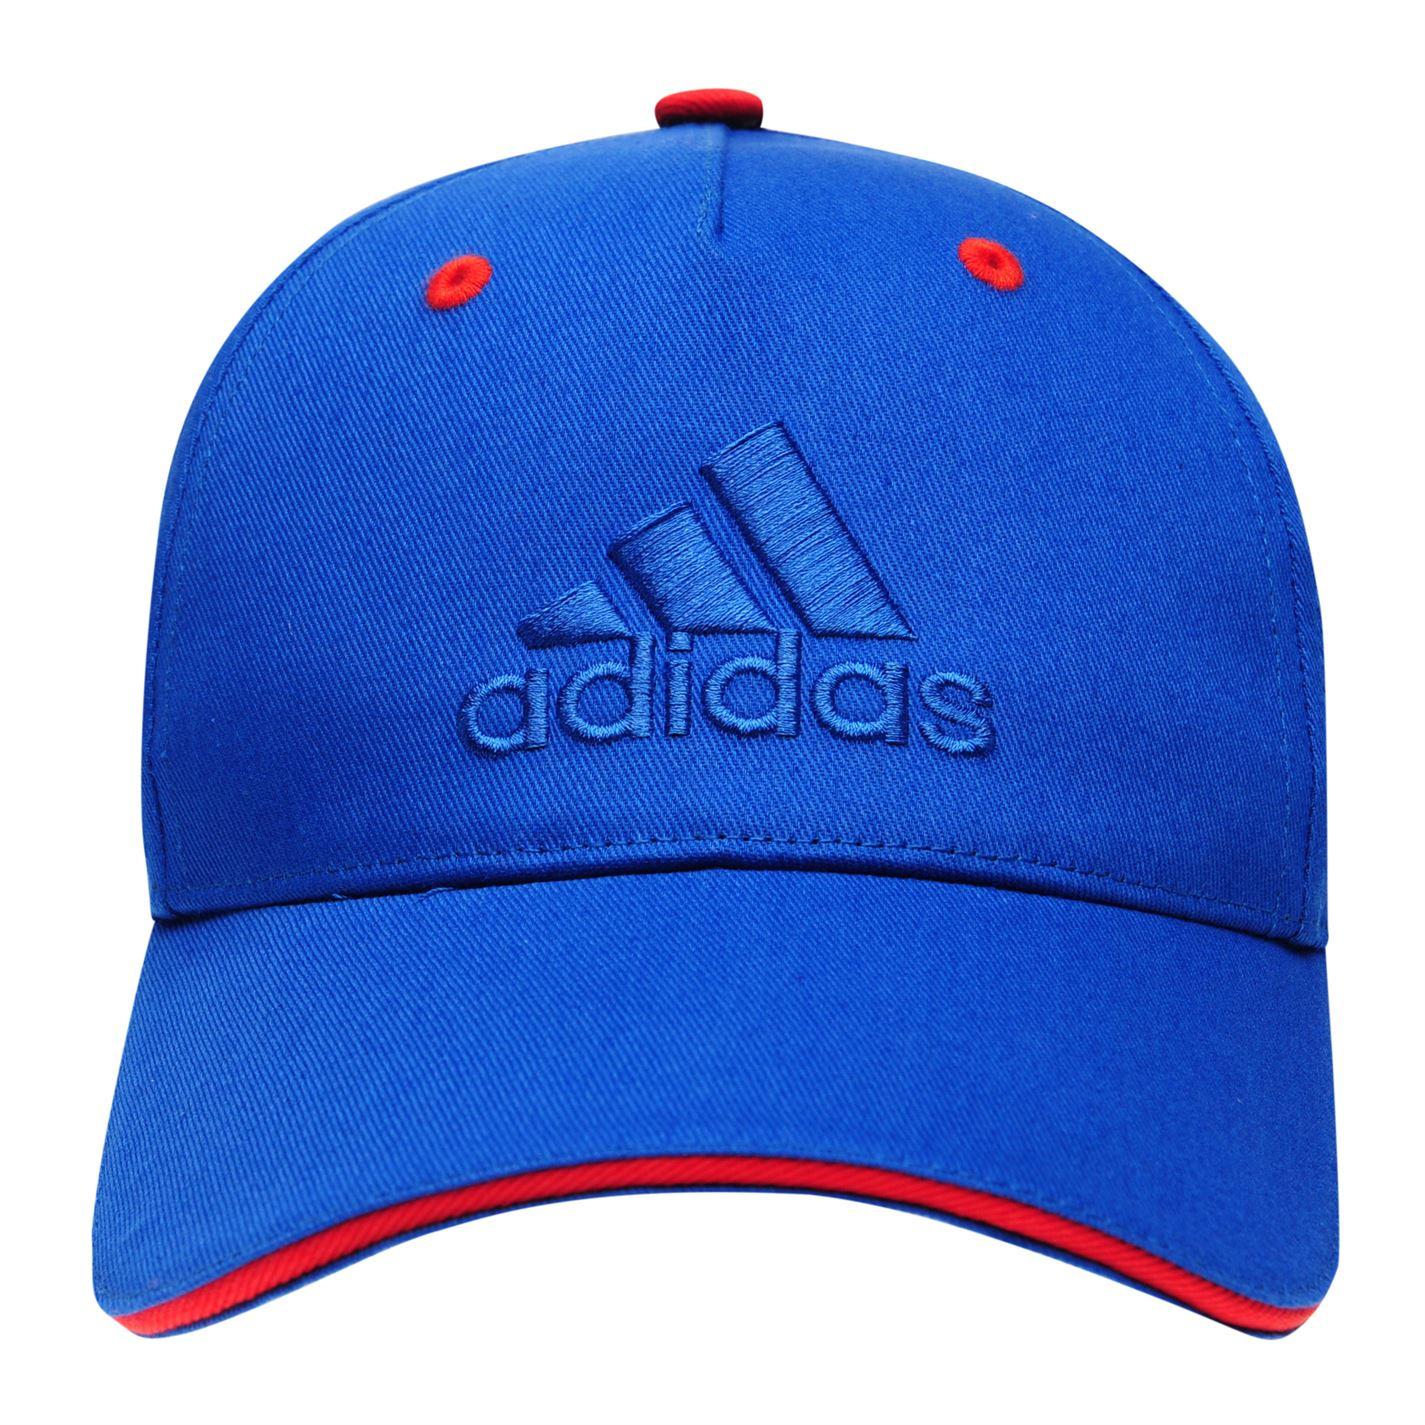 adidas LK Graph Cap Childrens Boys Baseball Cotton Tonal Stitching ... a749c39bc8f